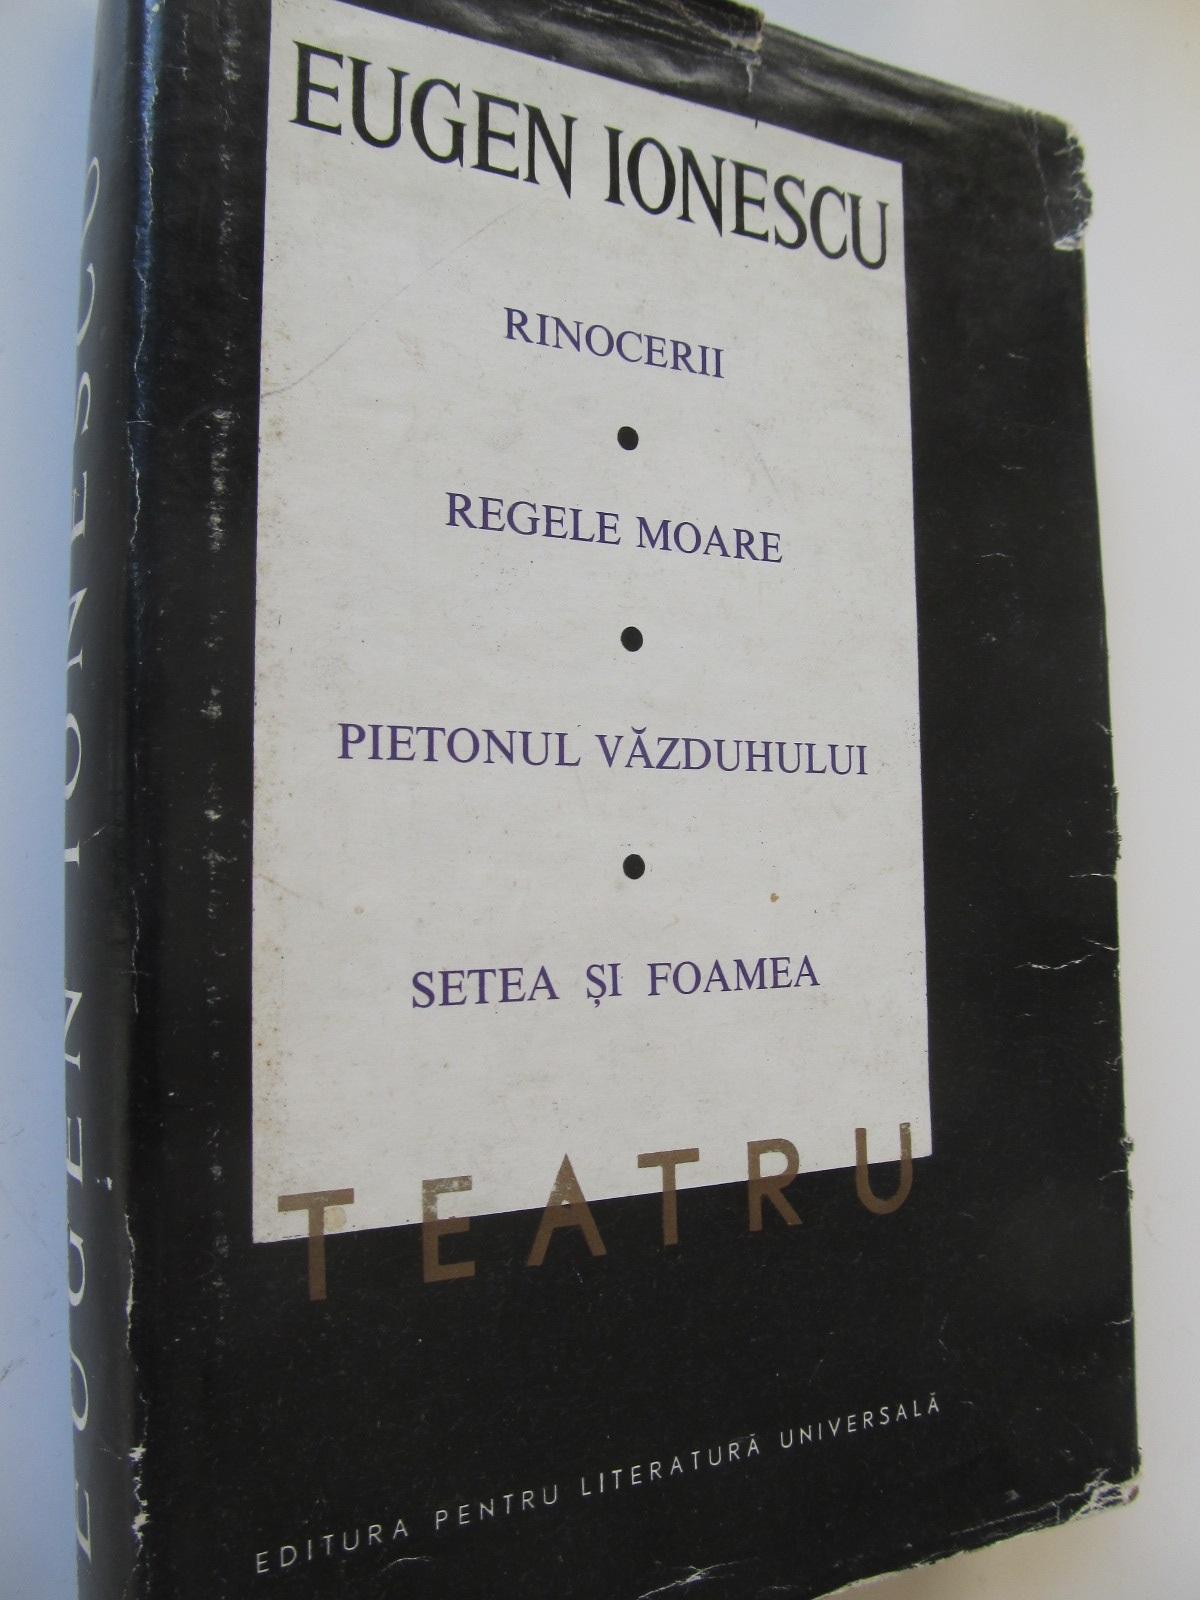 Teatru (vol. II) - Eugen Ionescu | Detalii carte